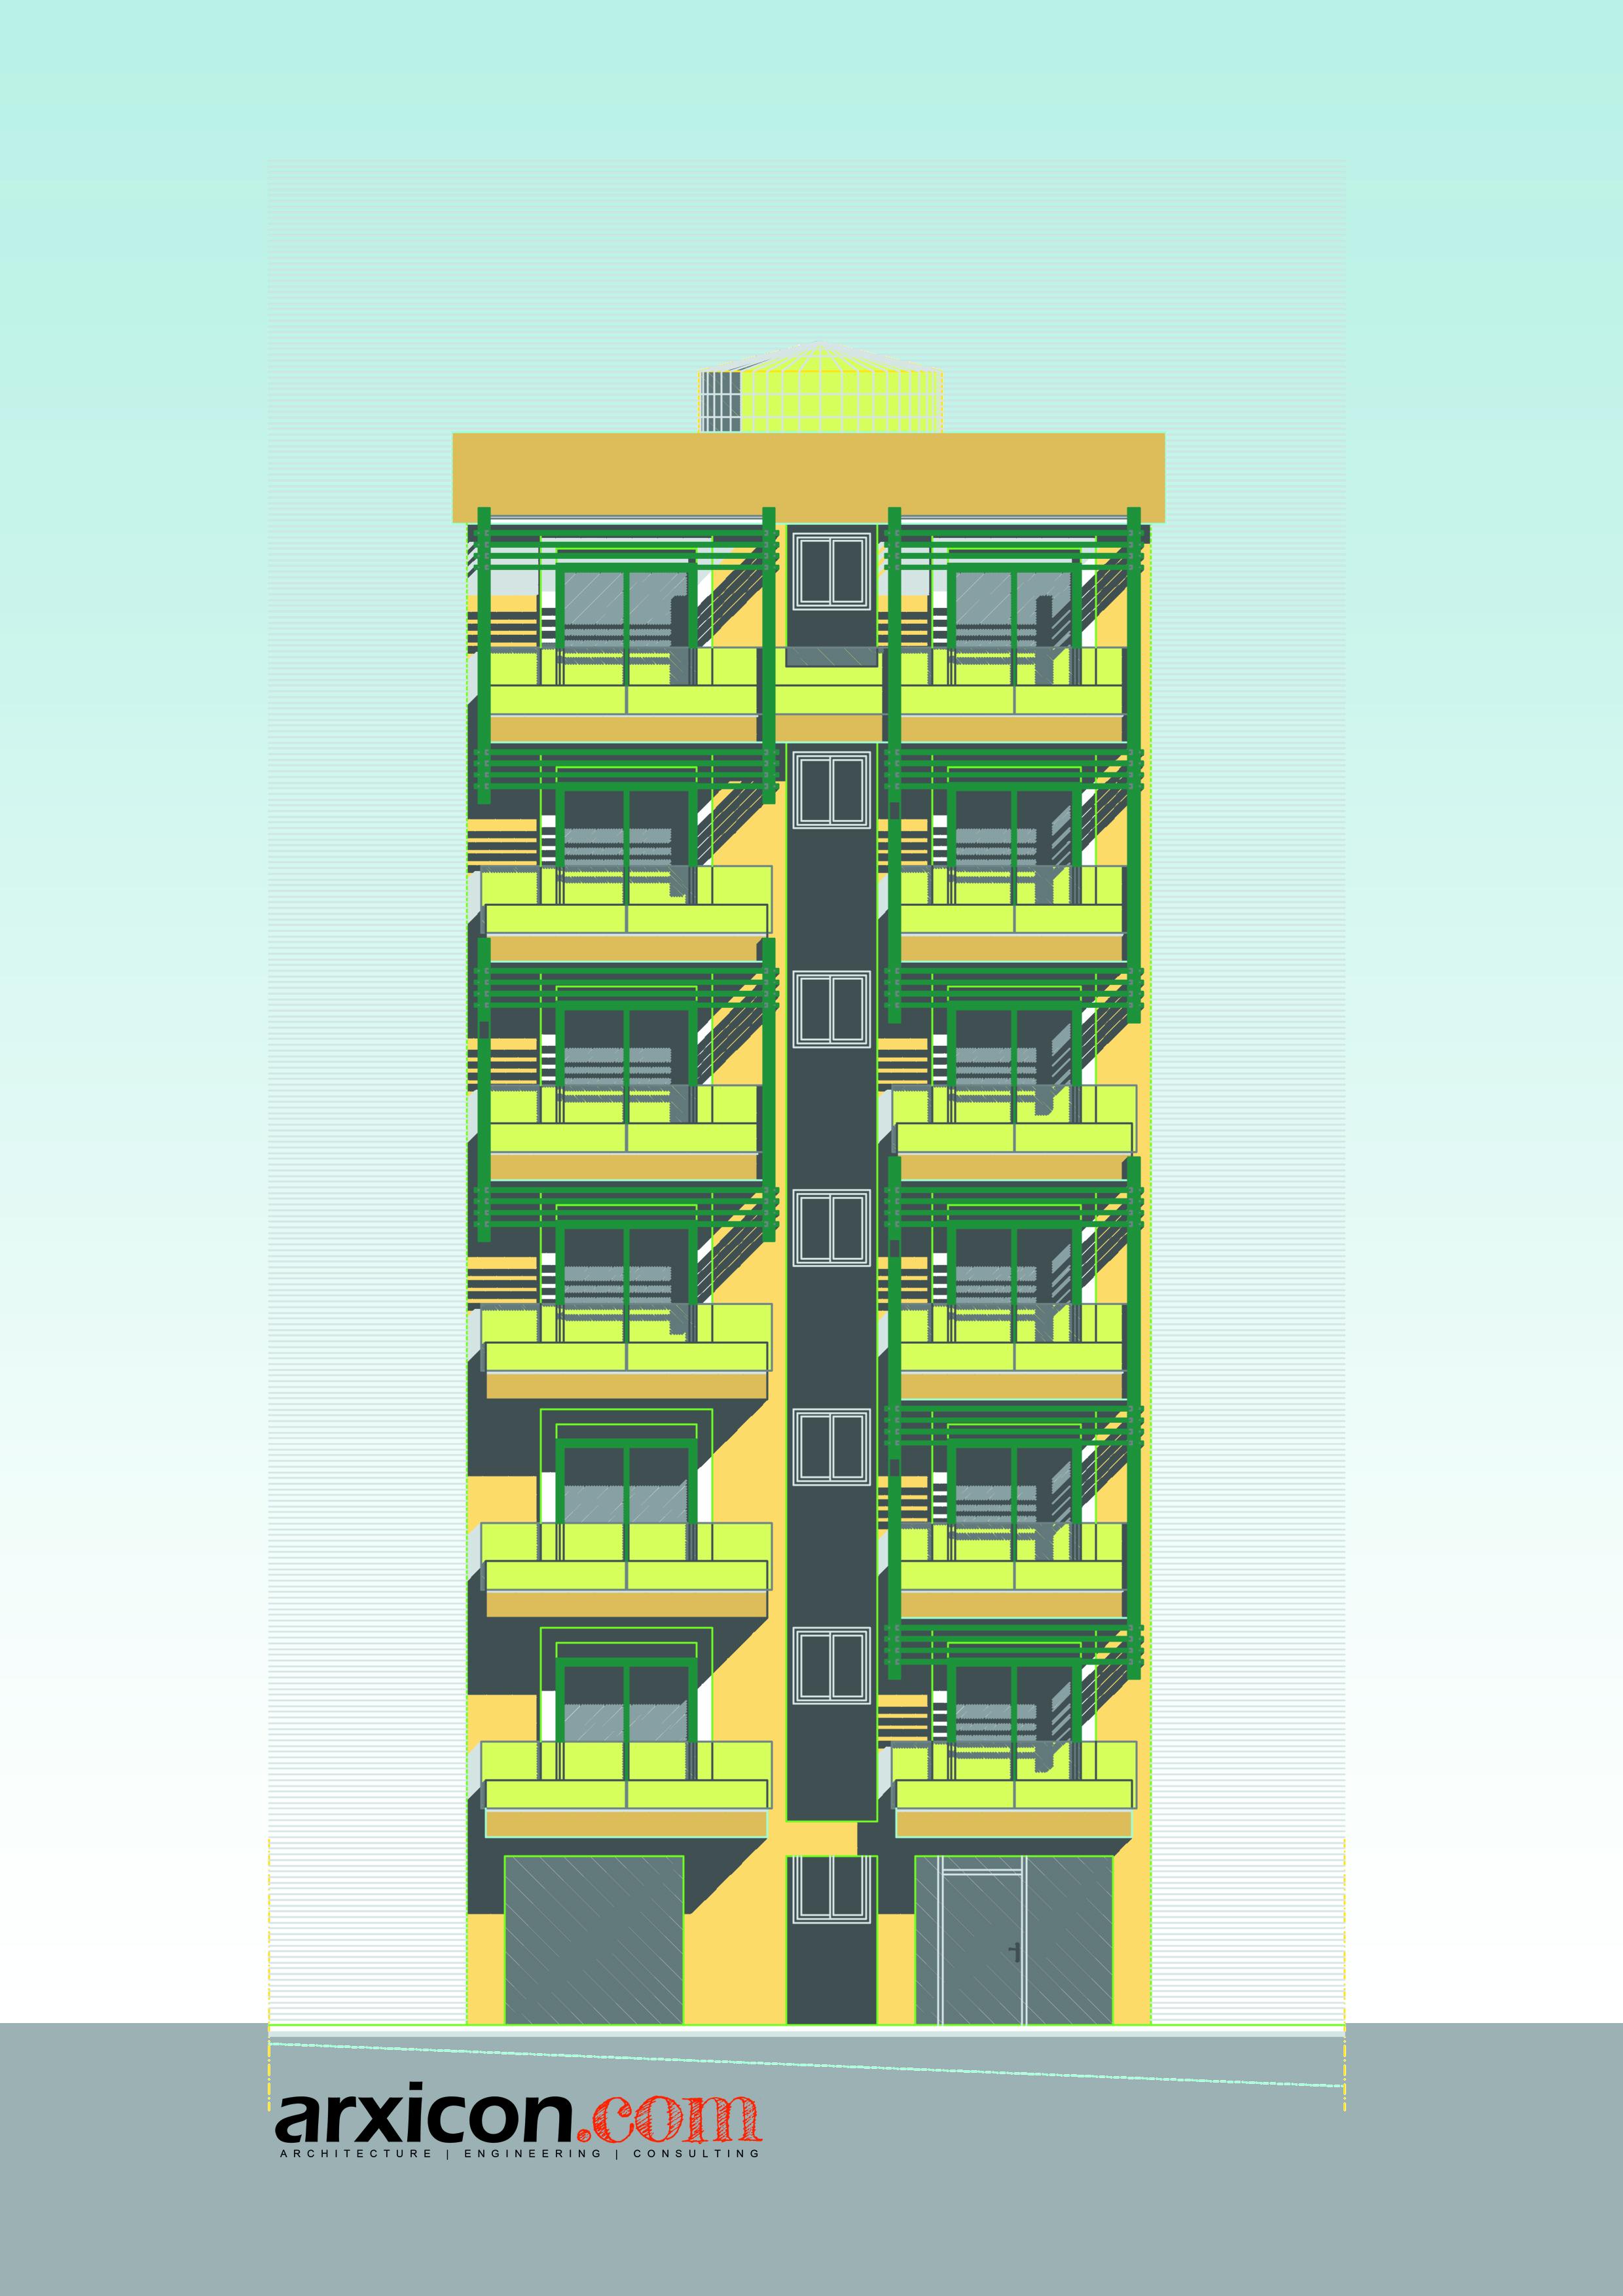 12 Apartments Building